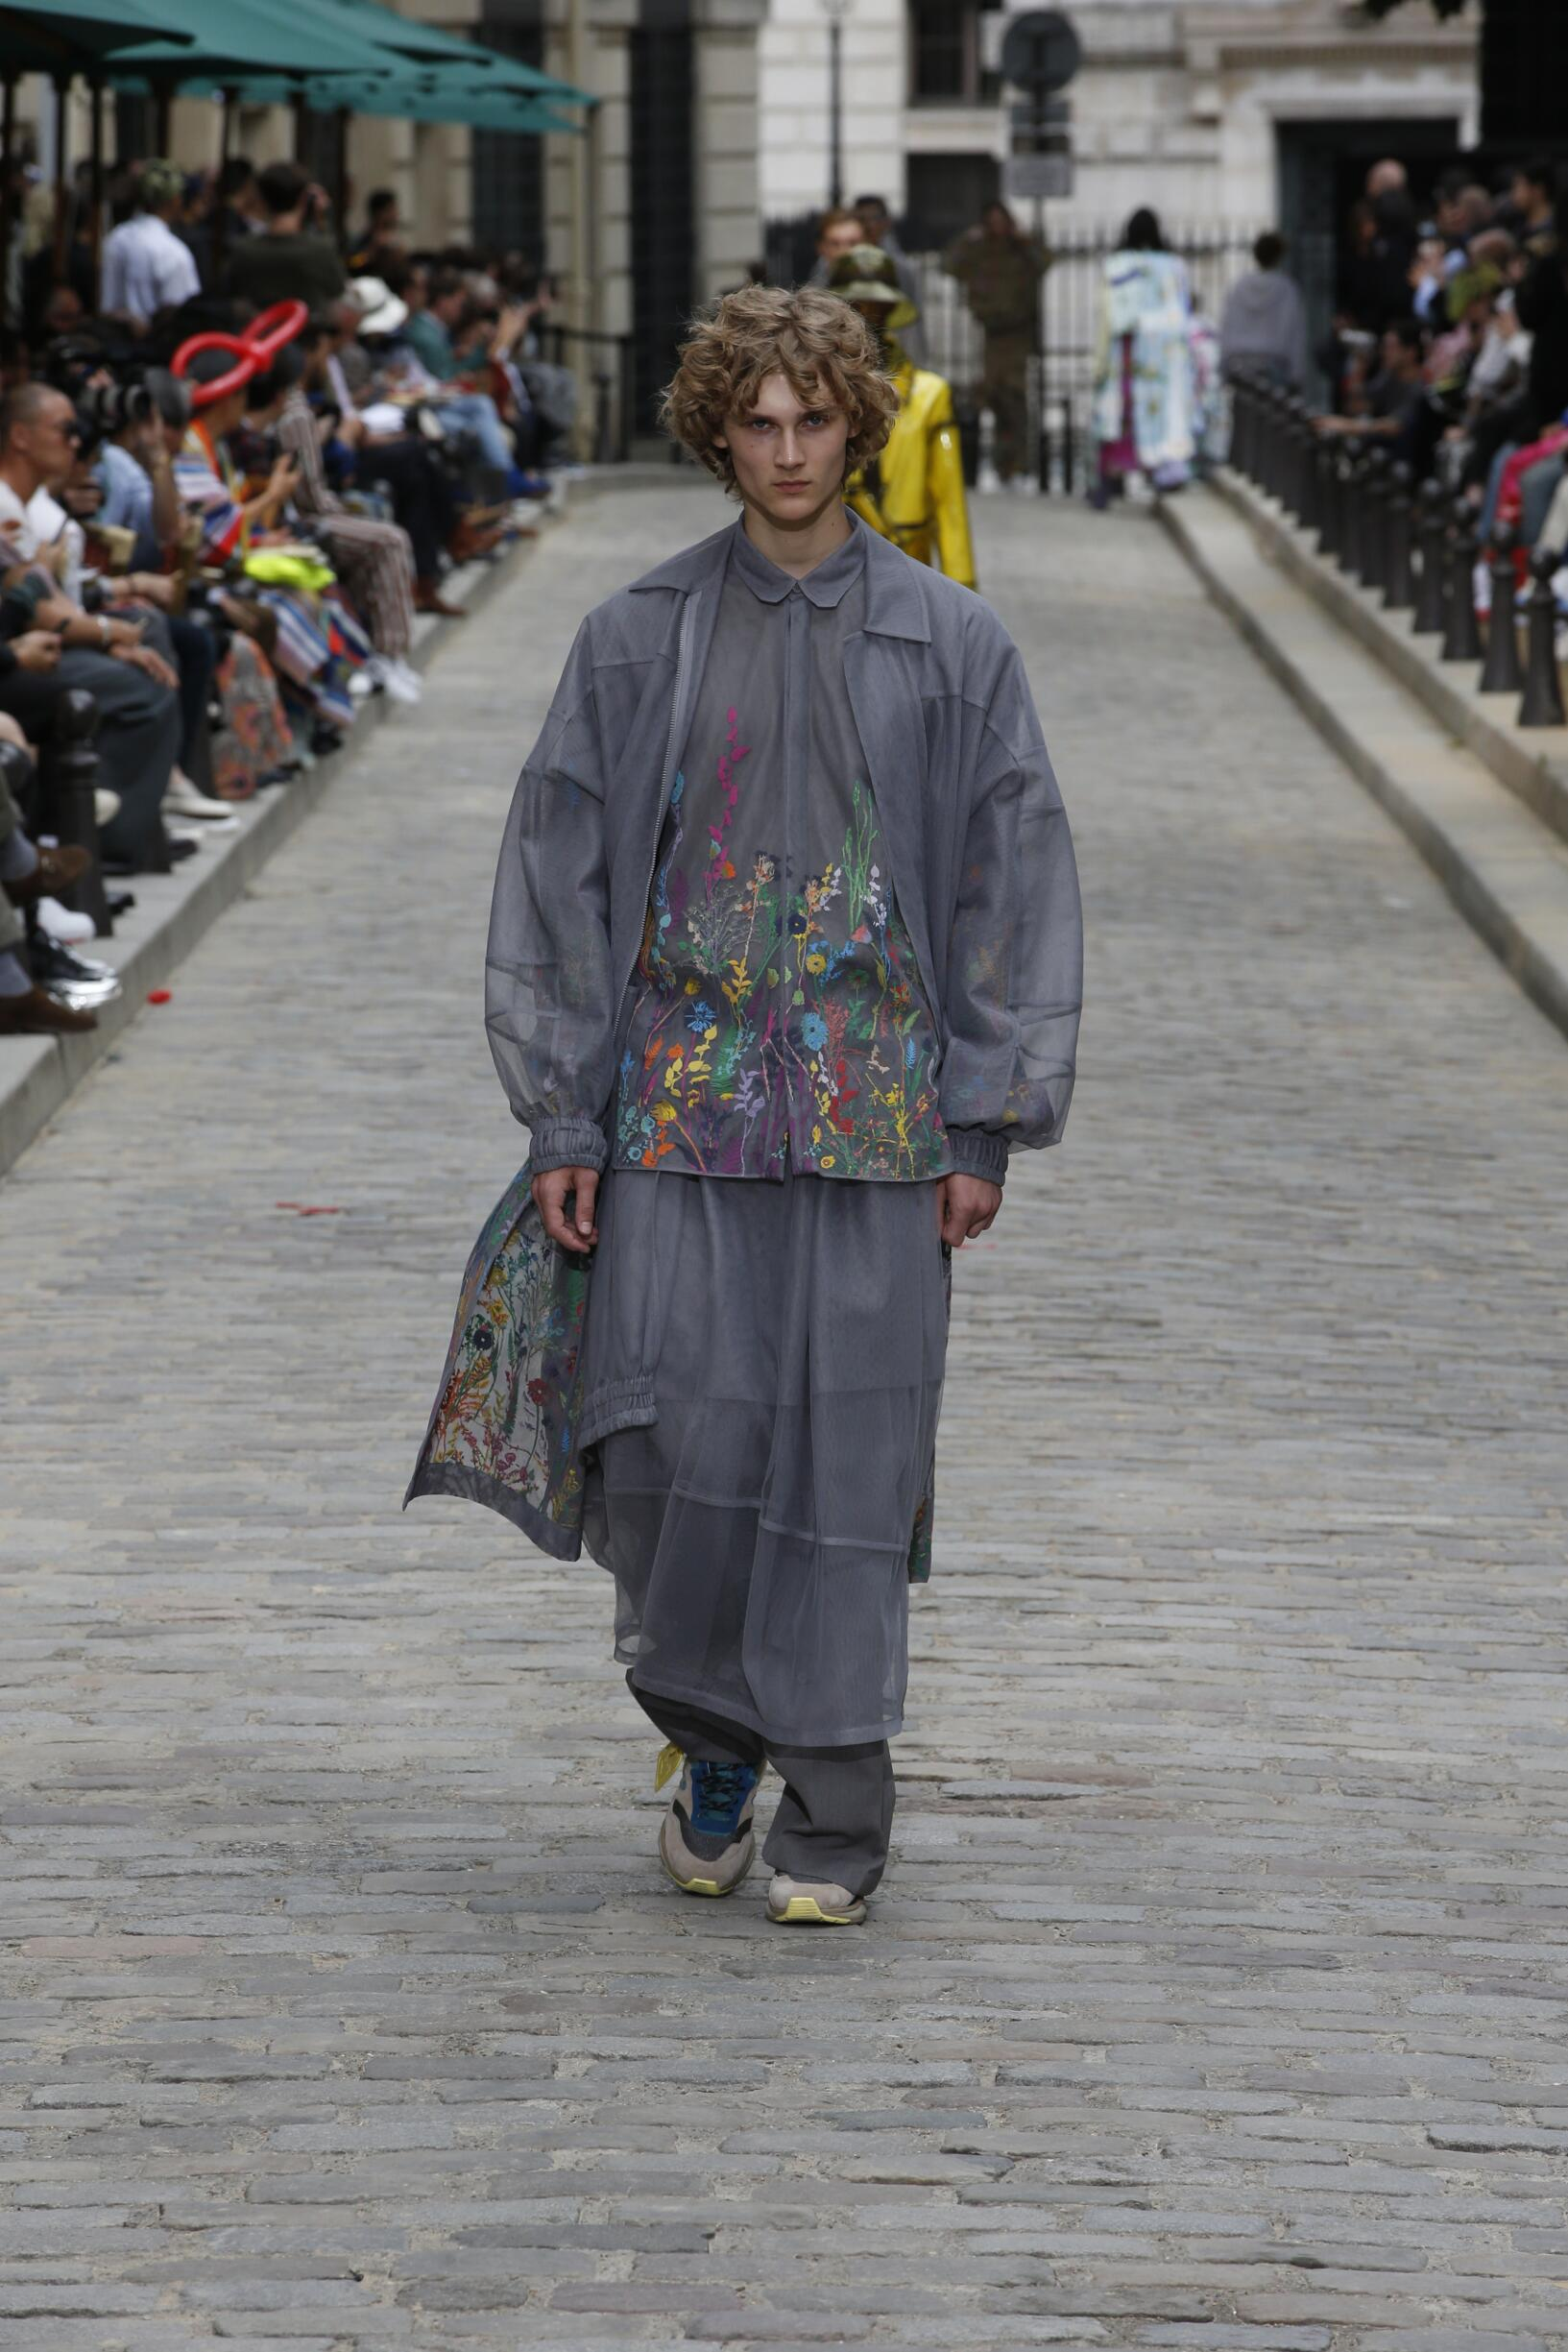 Louis Vuitton Man Style